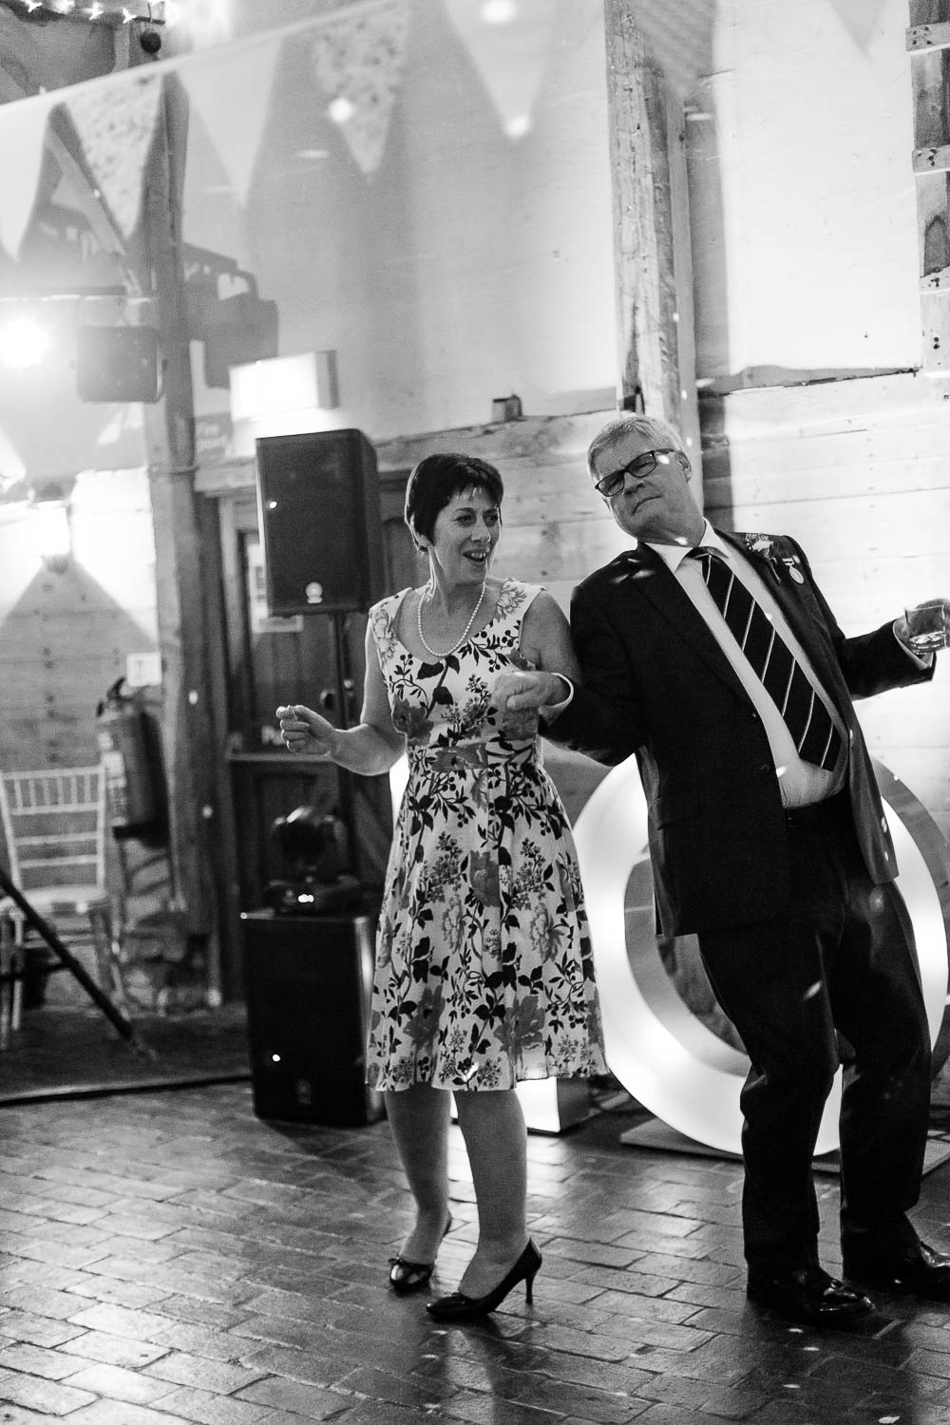 wedding-photographer-oxfordshire-film-photographer-chen-sands-hannah-wedding-cspblog-8.jpg